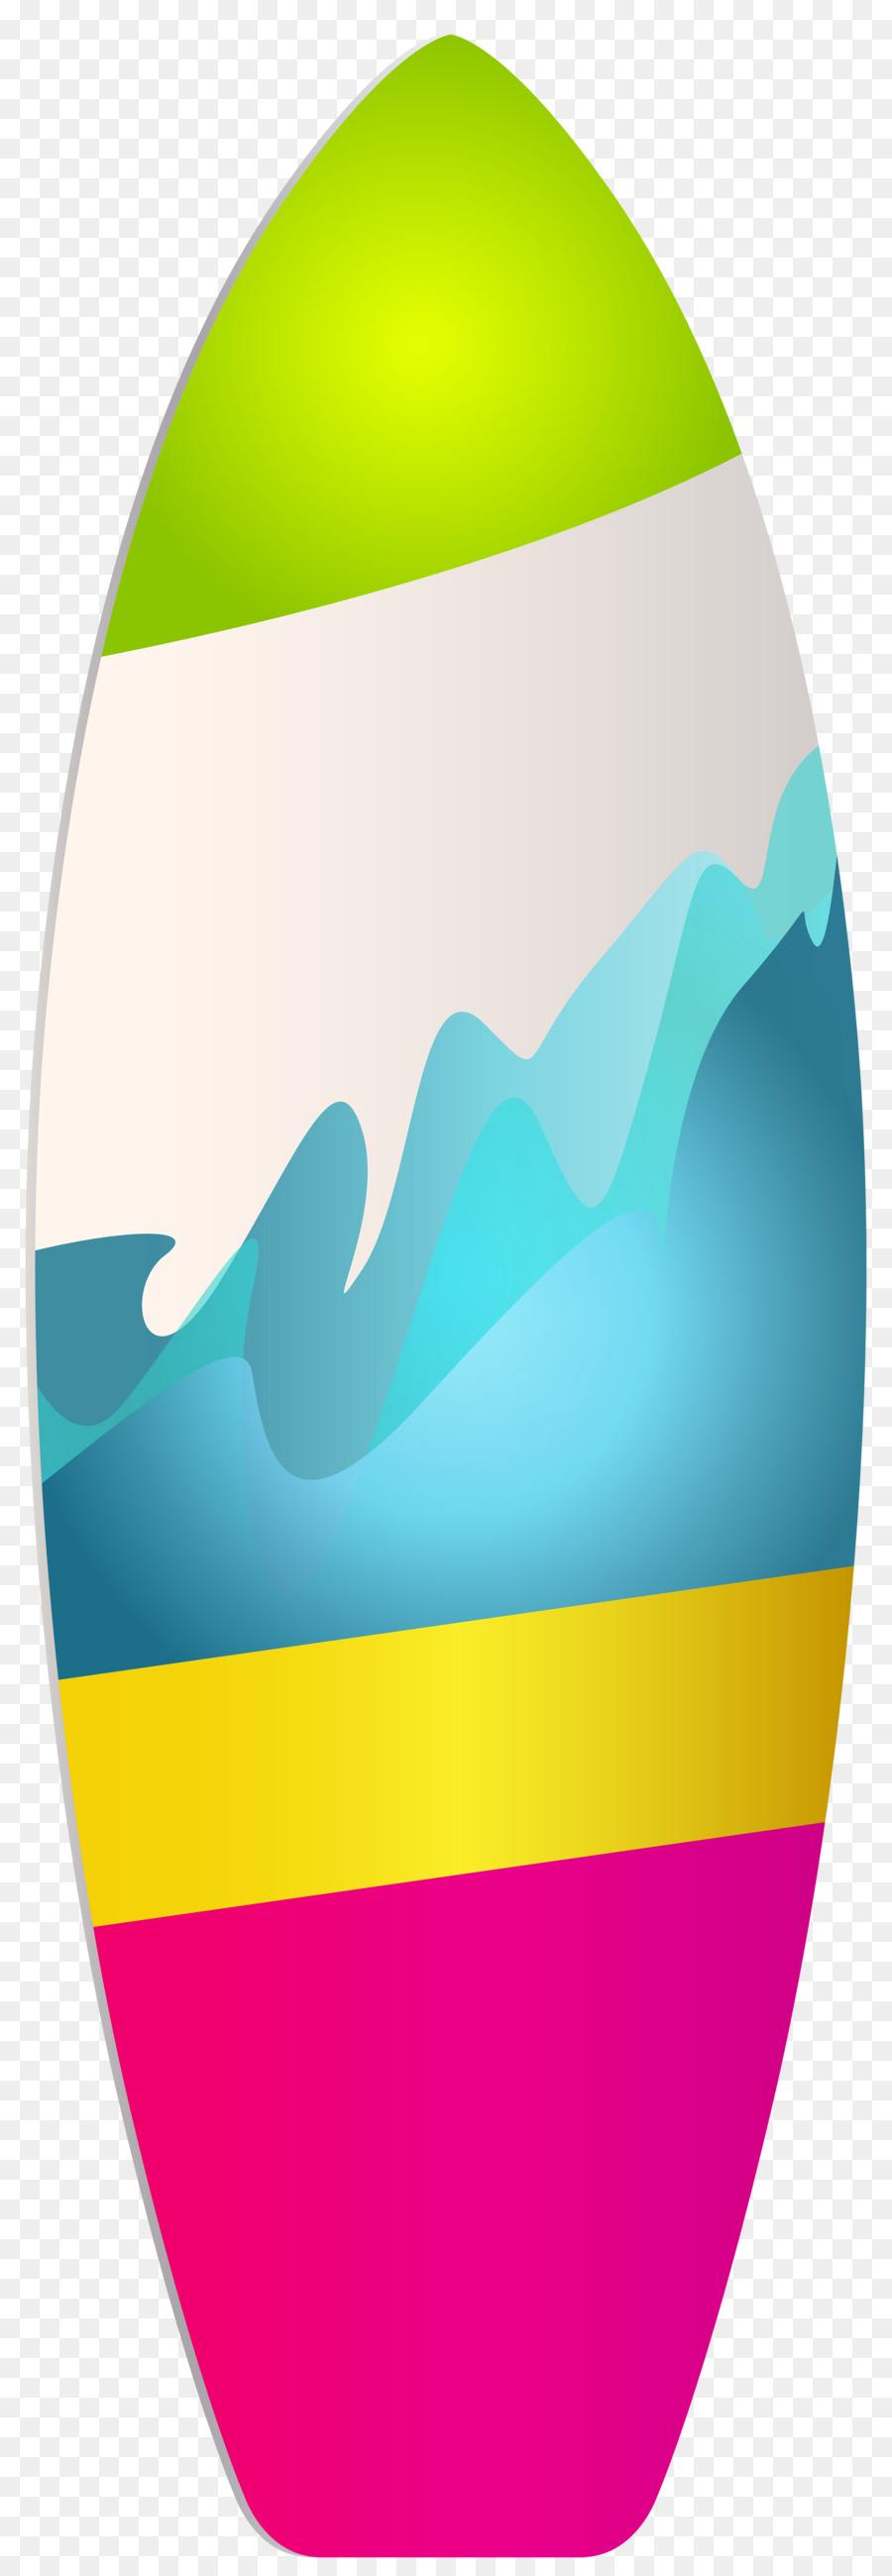 900x2600 Surfing Surfboard Clip Art